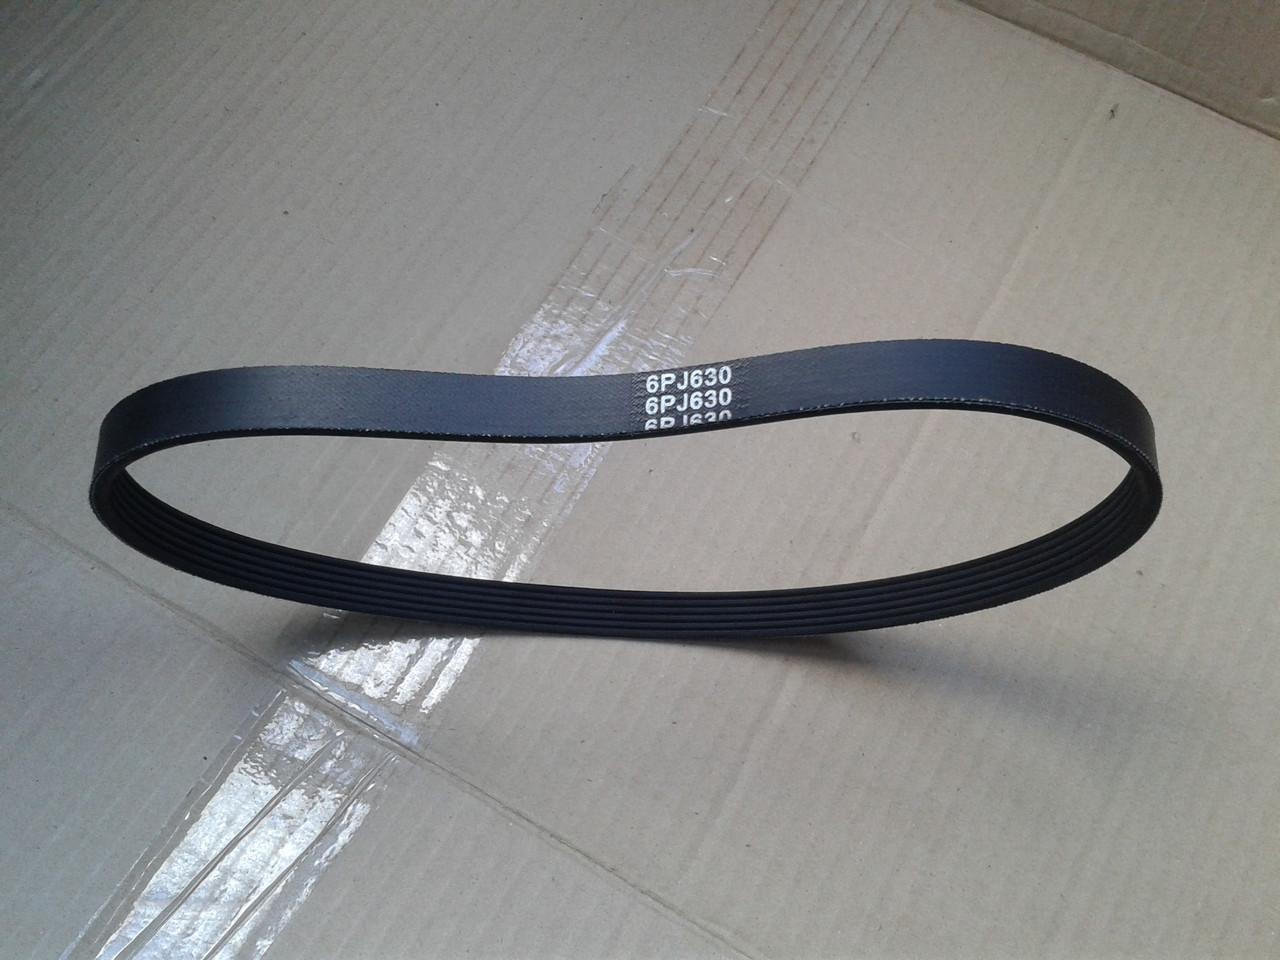 'Ремень для бетоносмесителя 630 SEB